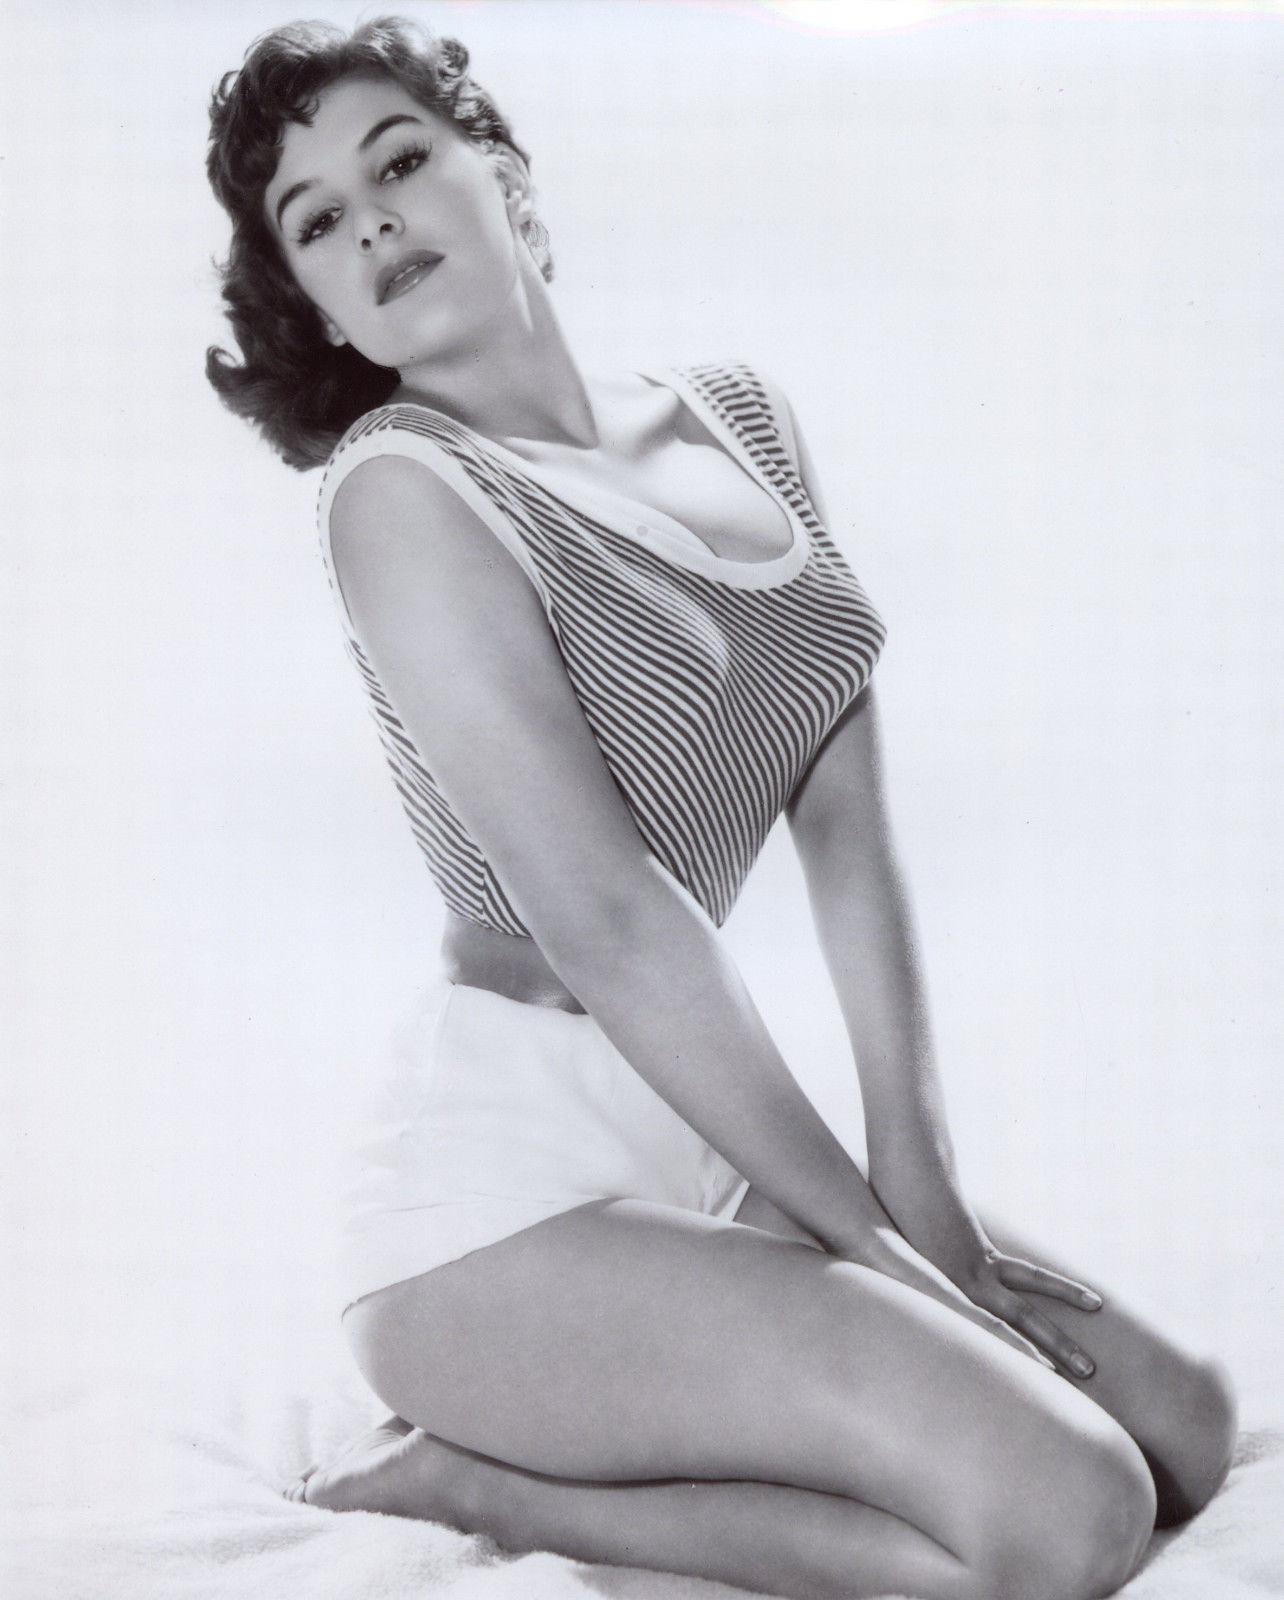 Sally Boyden (singer),Jennylyn Mercado (b. 1987) Hot tube Mikie Hara (b. 1987),Gary Farmer